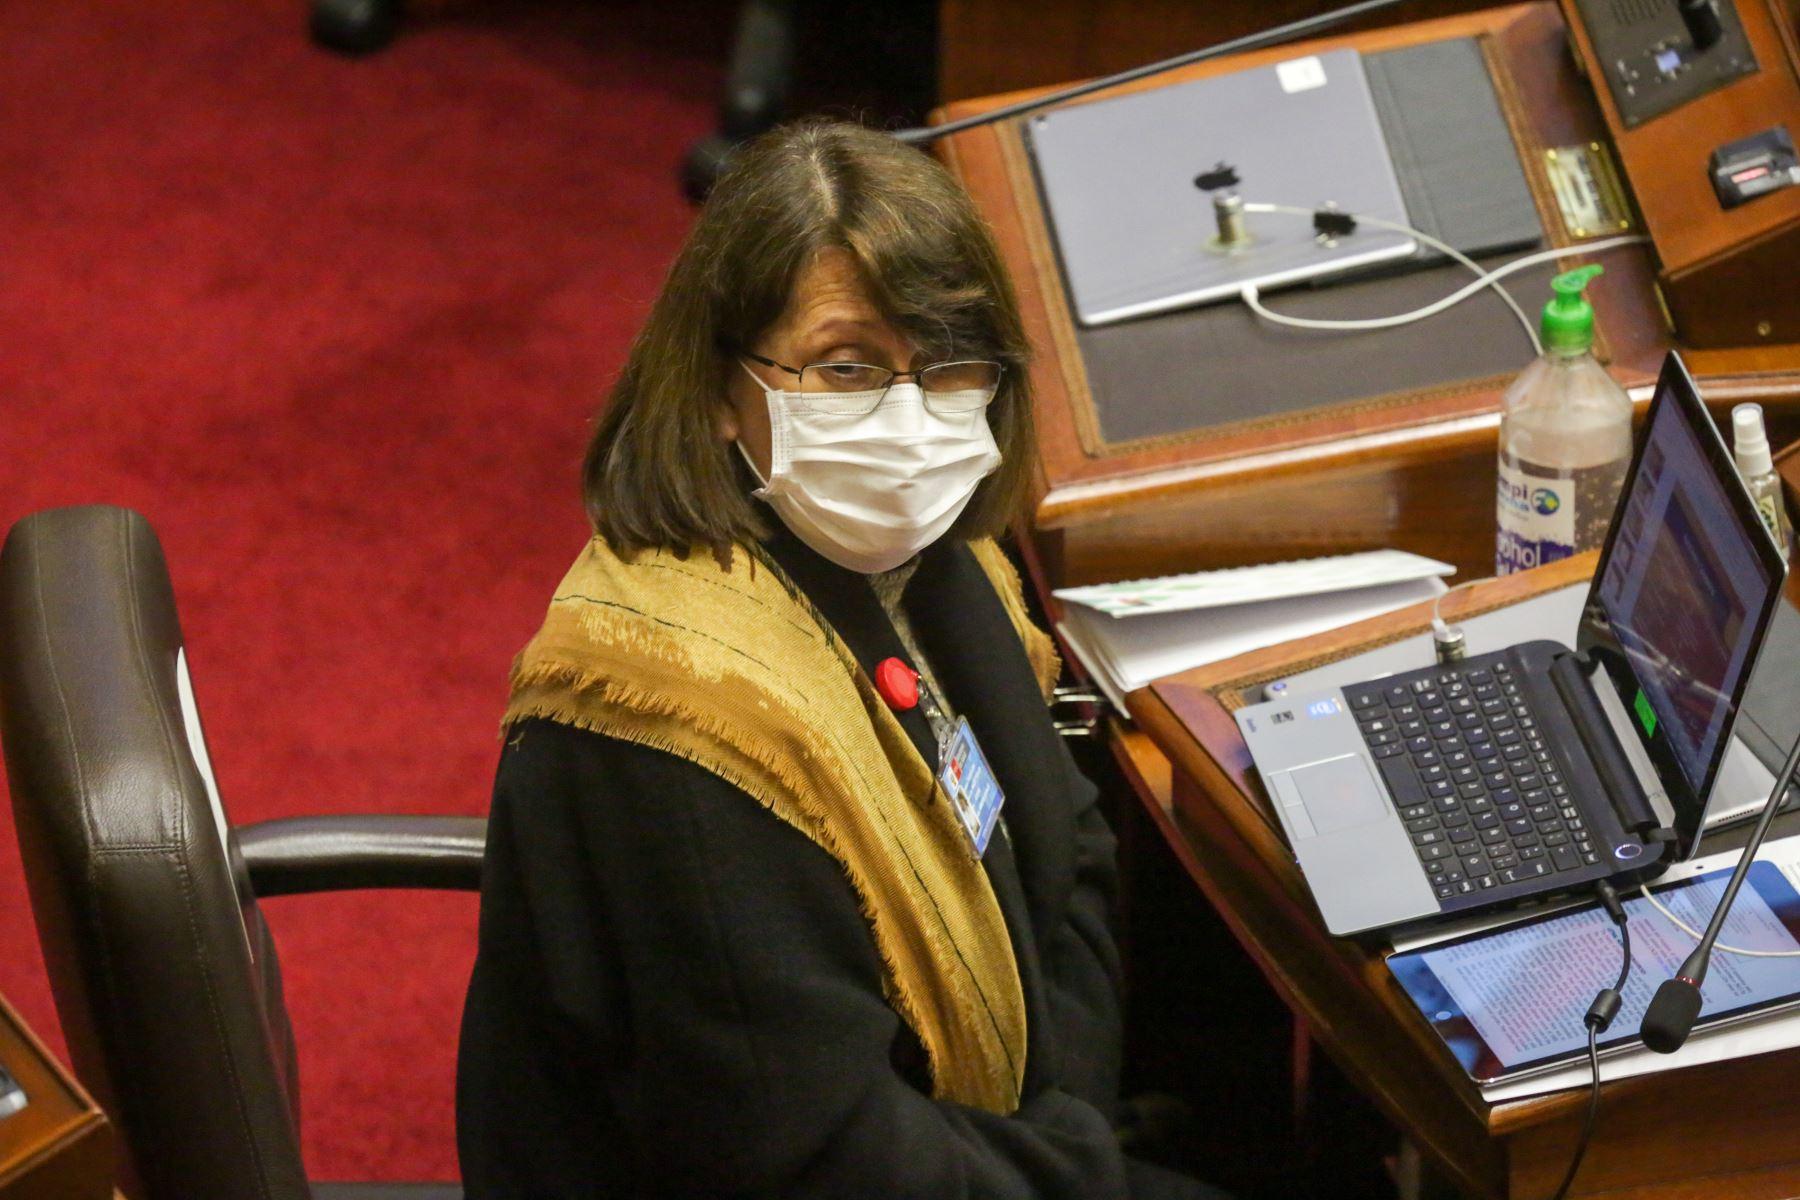 Ministra de Salud, Pilar Mazzetti, se presenta ante Congreso junto a gabinete ministerial para solicitar voto de confianza. Foto: ANDINA/PCM